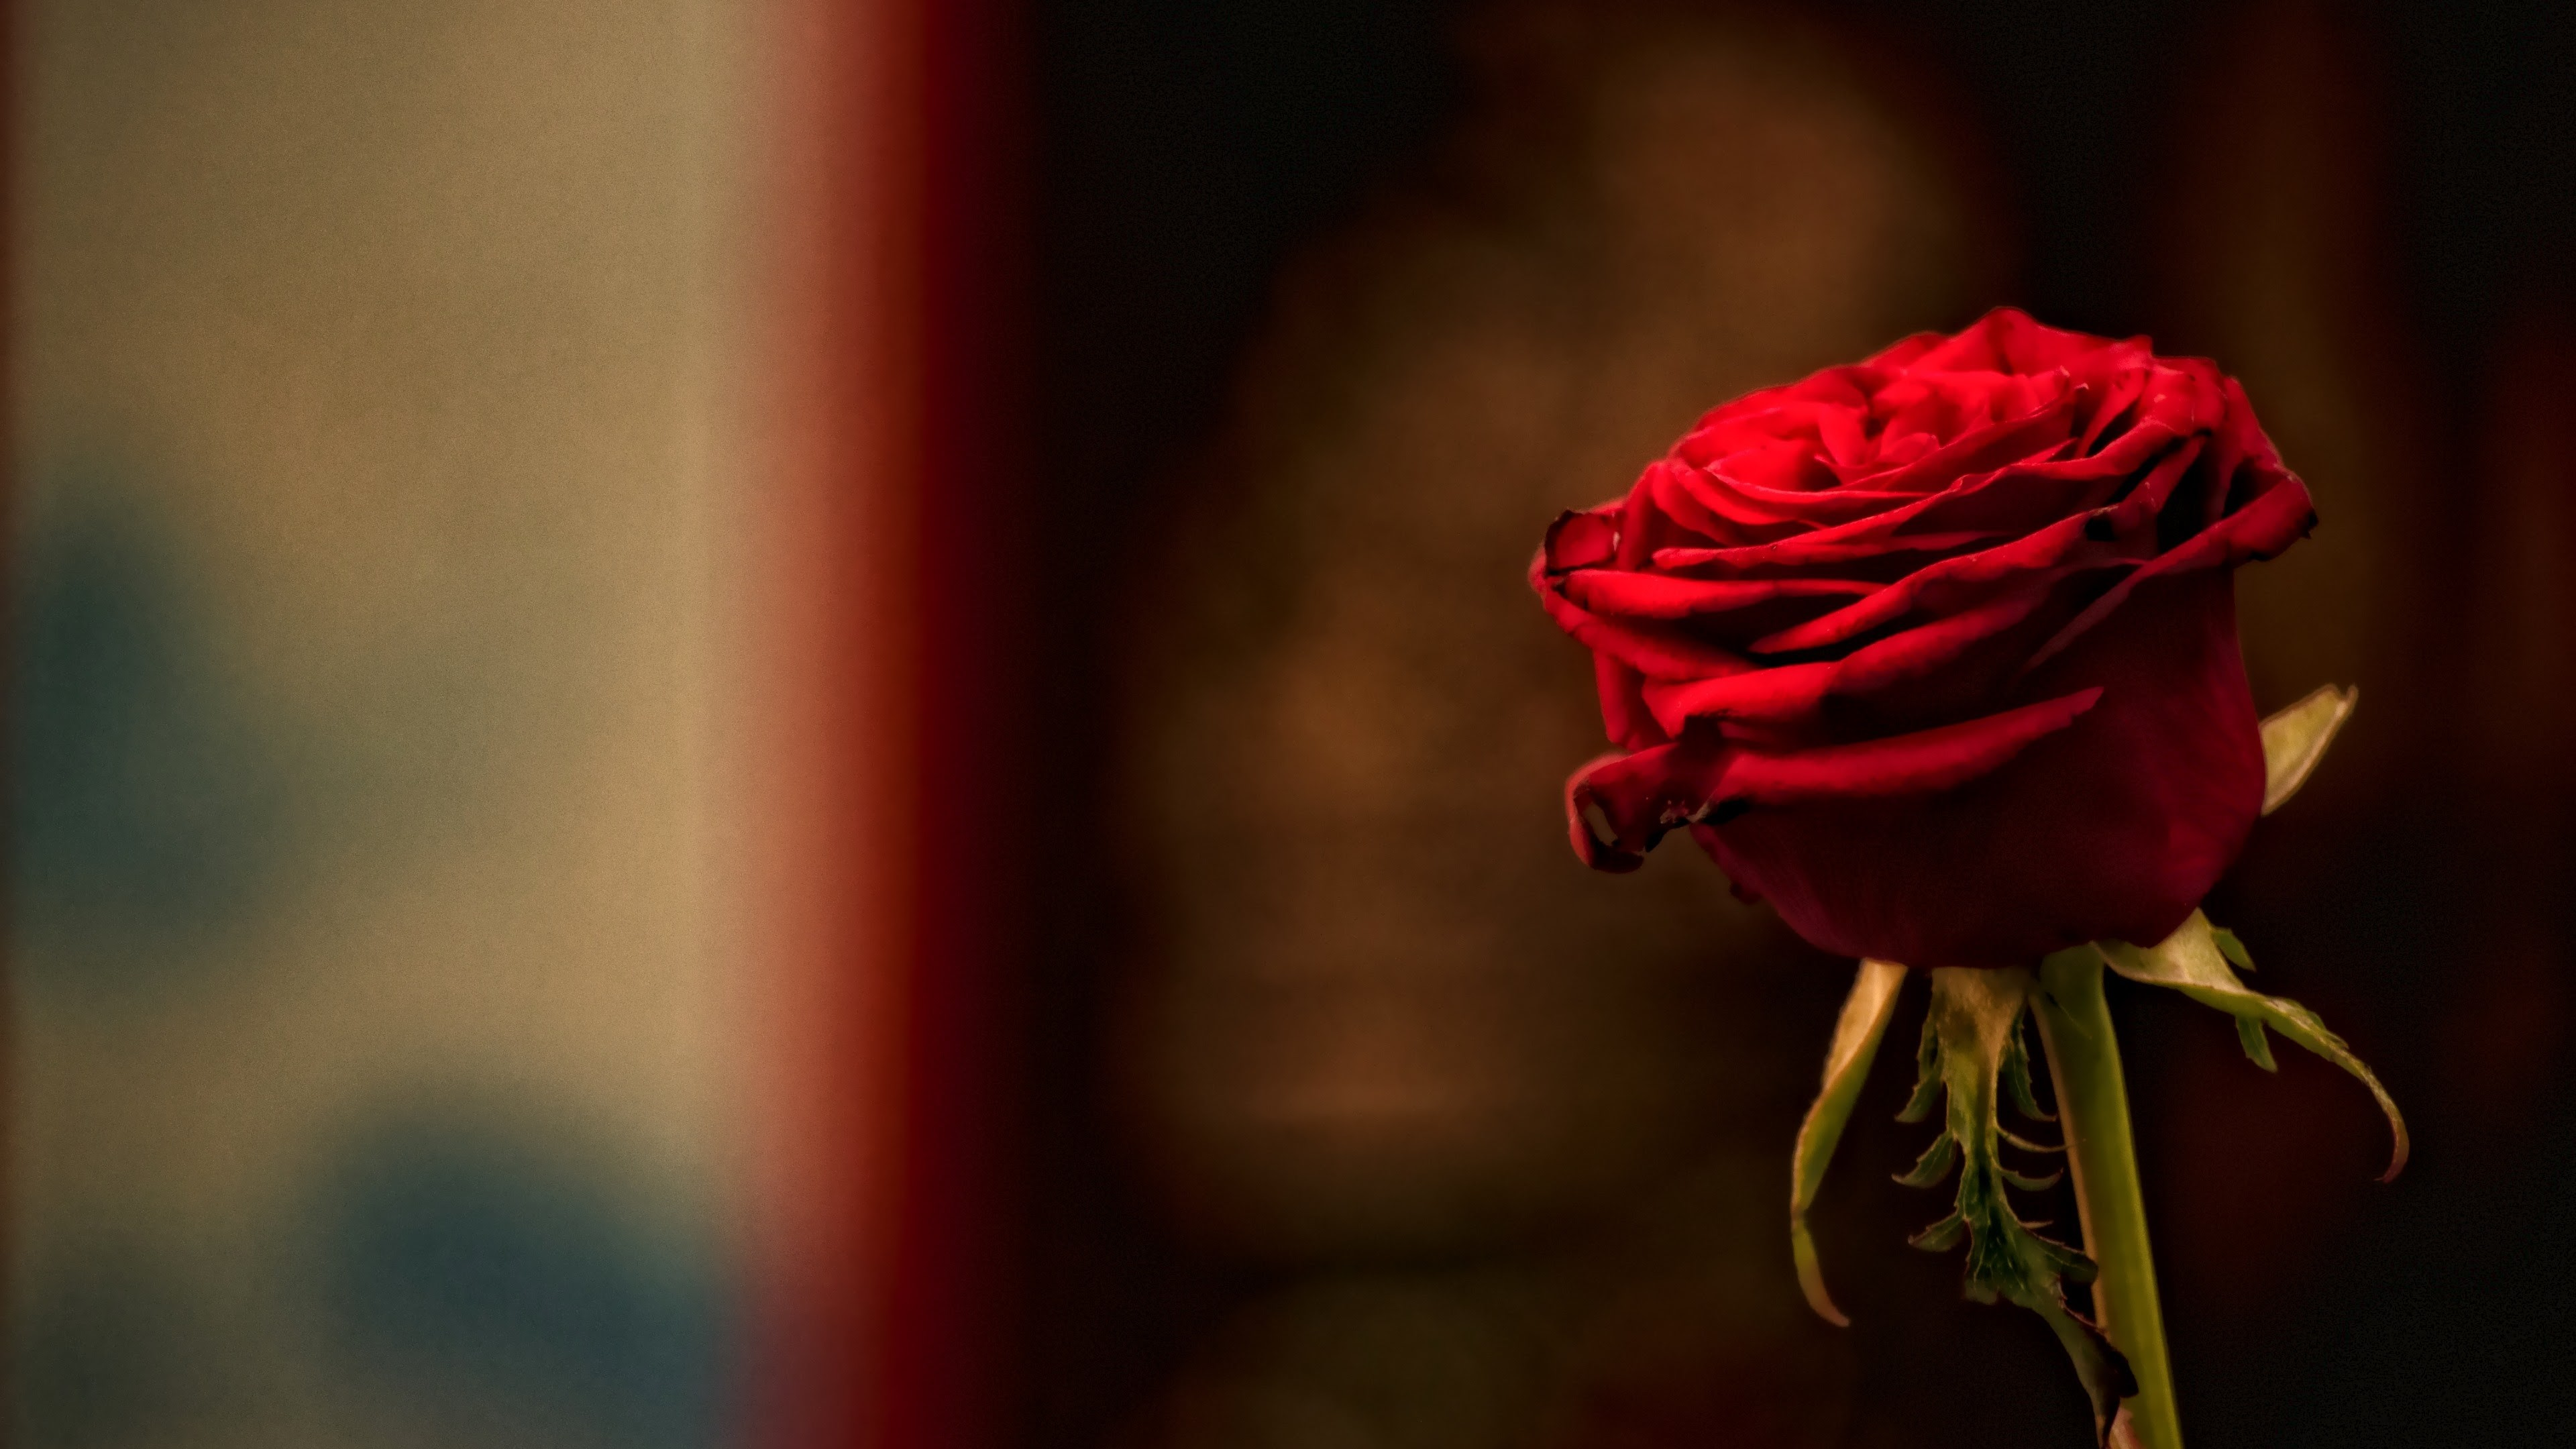 Romanticos Fondos De Pantalla: Red Roses Wallpapers For Desktop (50+ Images